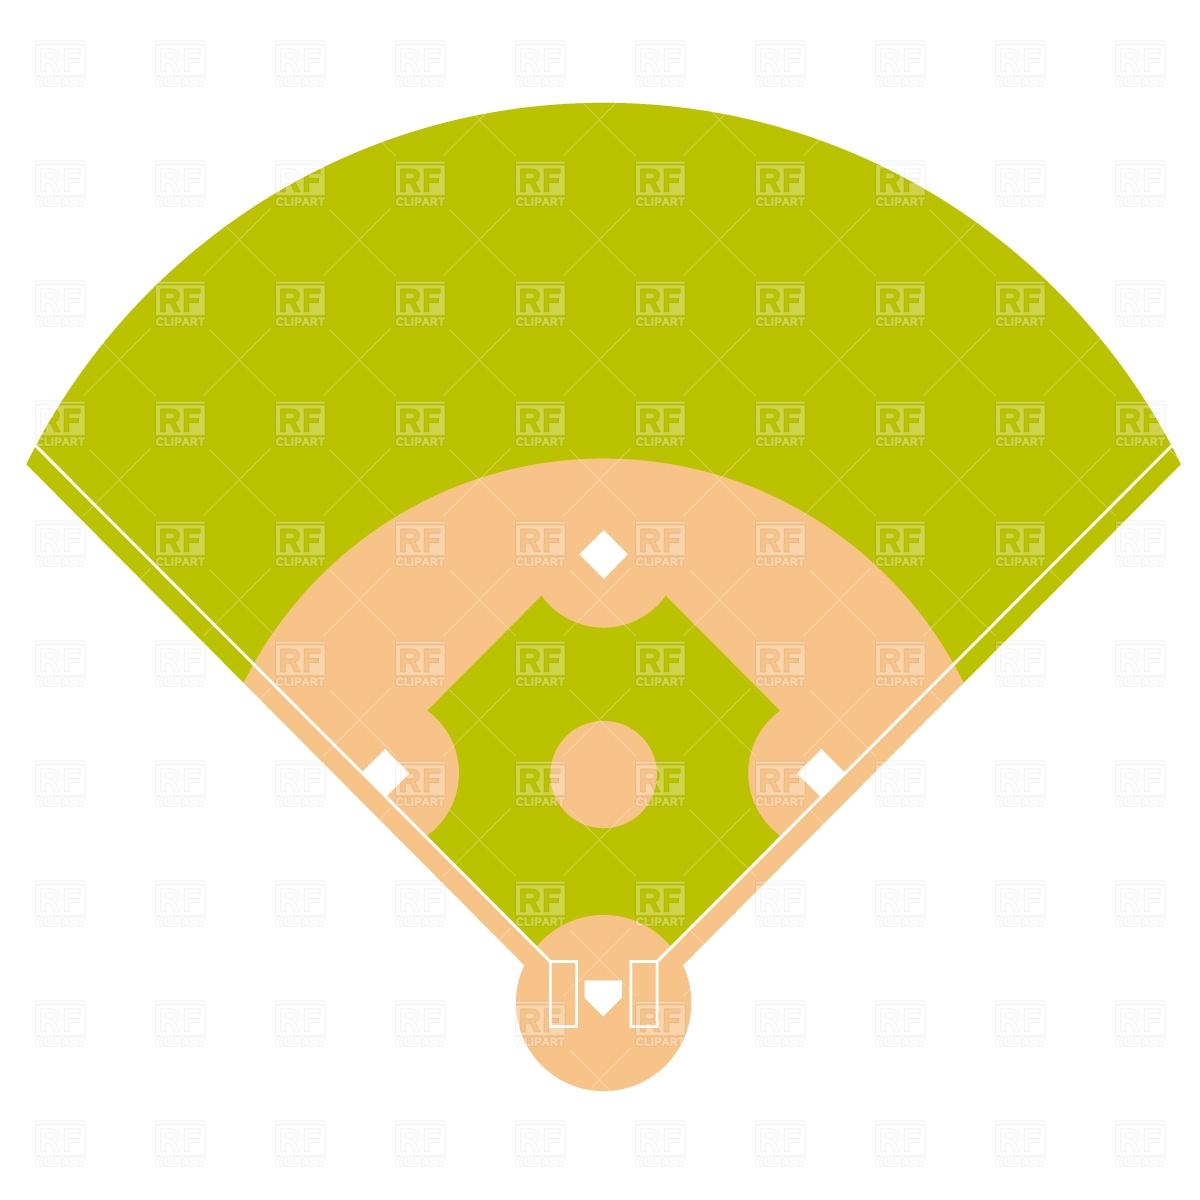 1200x1200 Baseball Field Plan Drawing Free Download Vector Clip Art Image